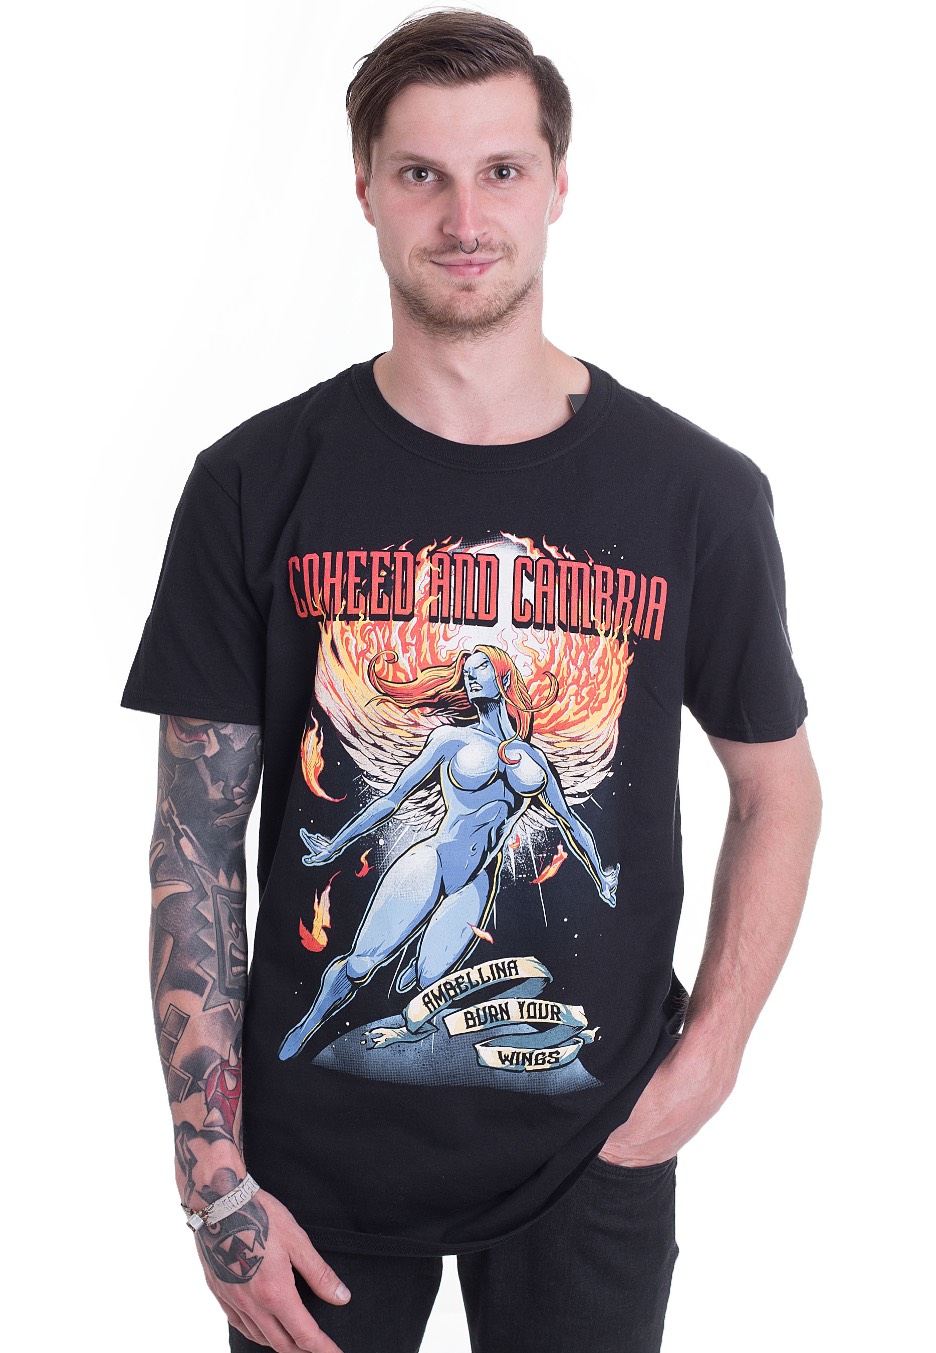 Coheed And Cambria - Ambellina - T-Shirt